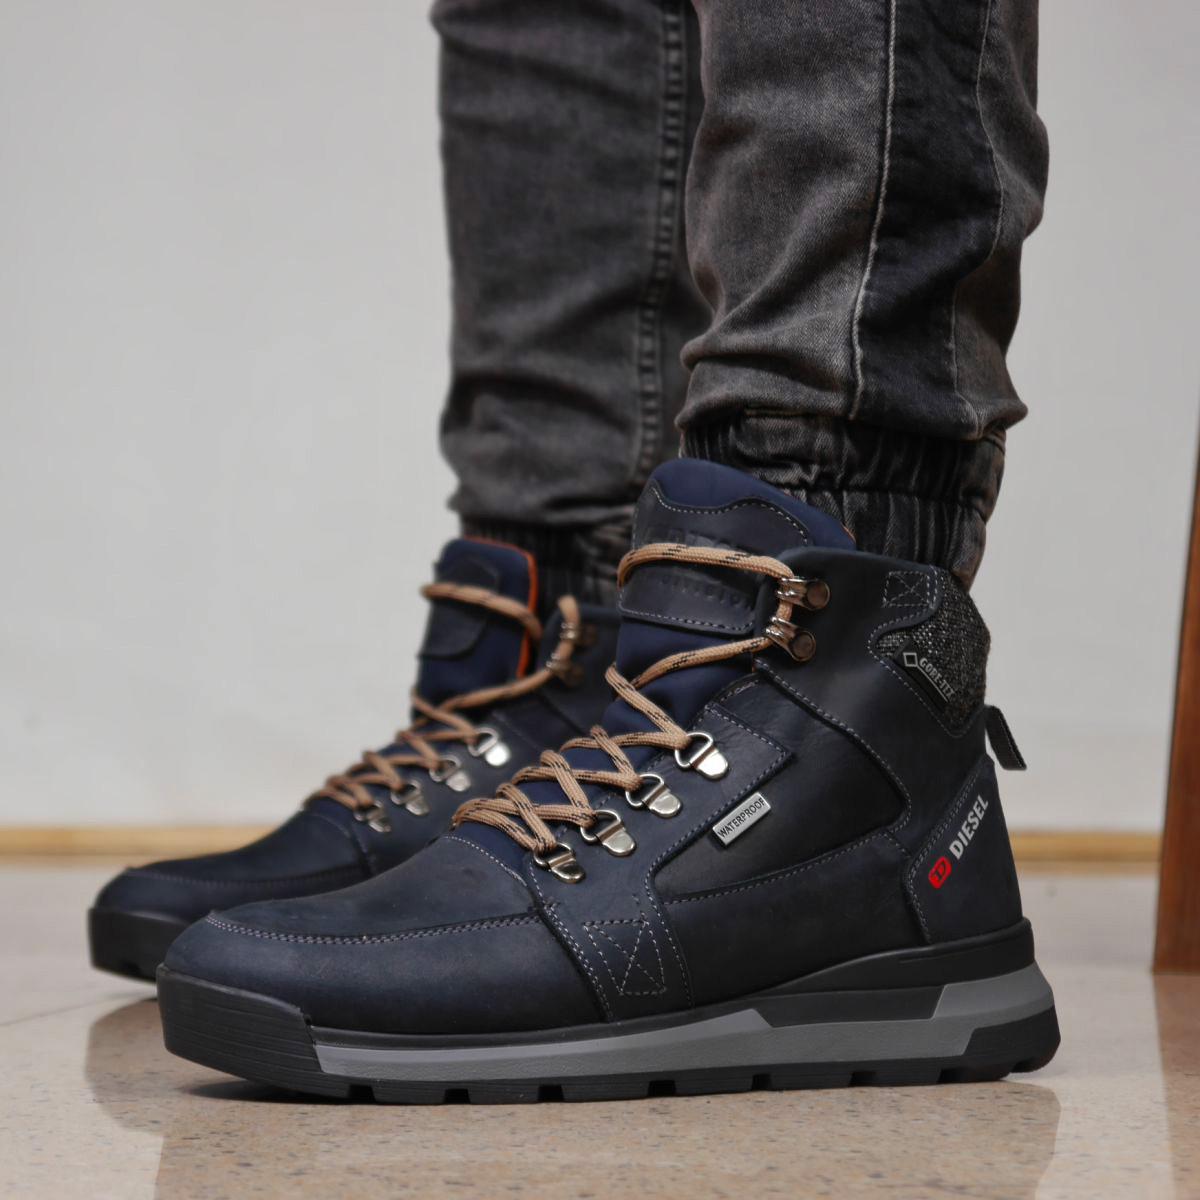 Зимние мужские ботинки 31911, Diesel Denim Devision, темно-синие, [ 40 42 43 44 ] р. 40-26,5см.